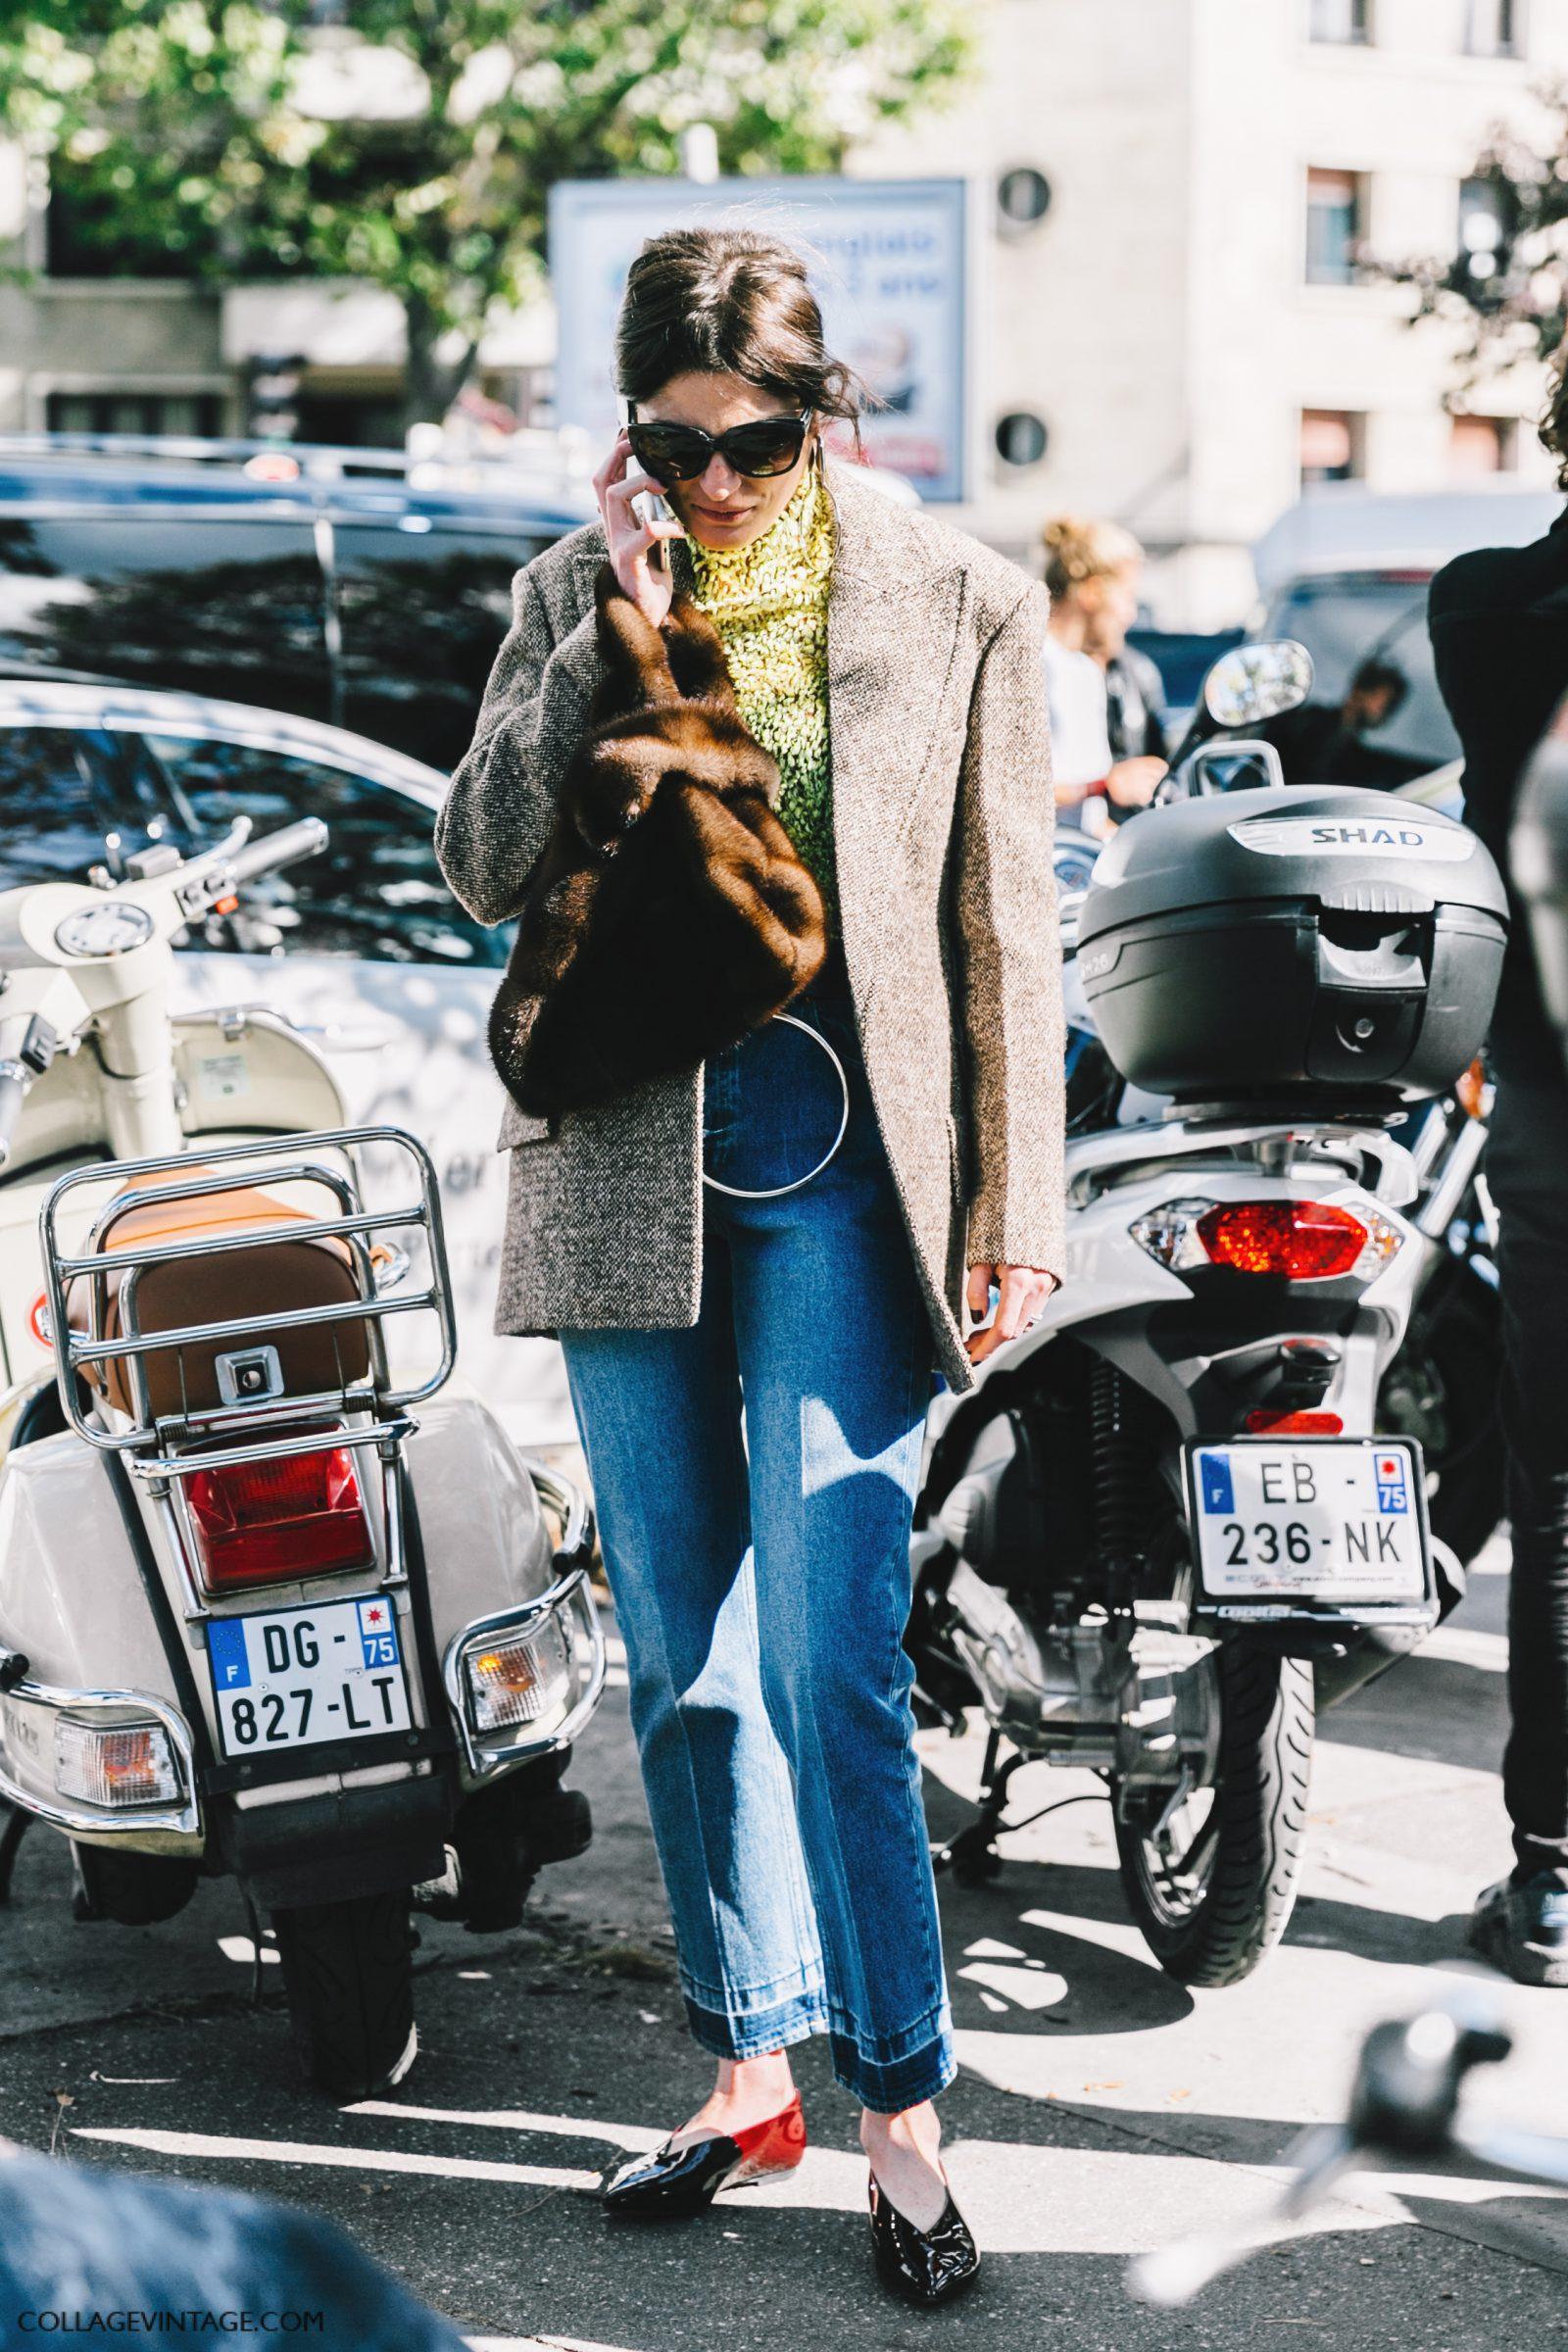 pfw-paris_fashion_week_ss17-street_style-outfits-collage_vintage-valentino-balenciaga-celine-70